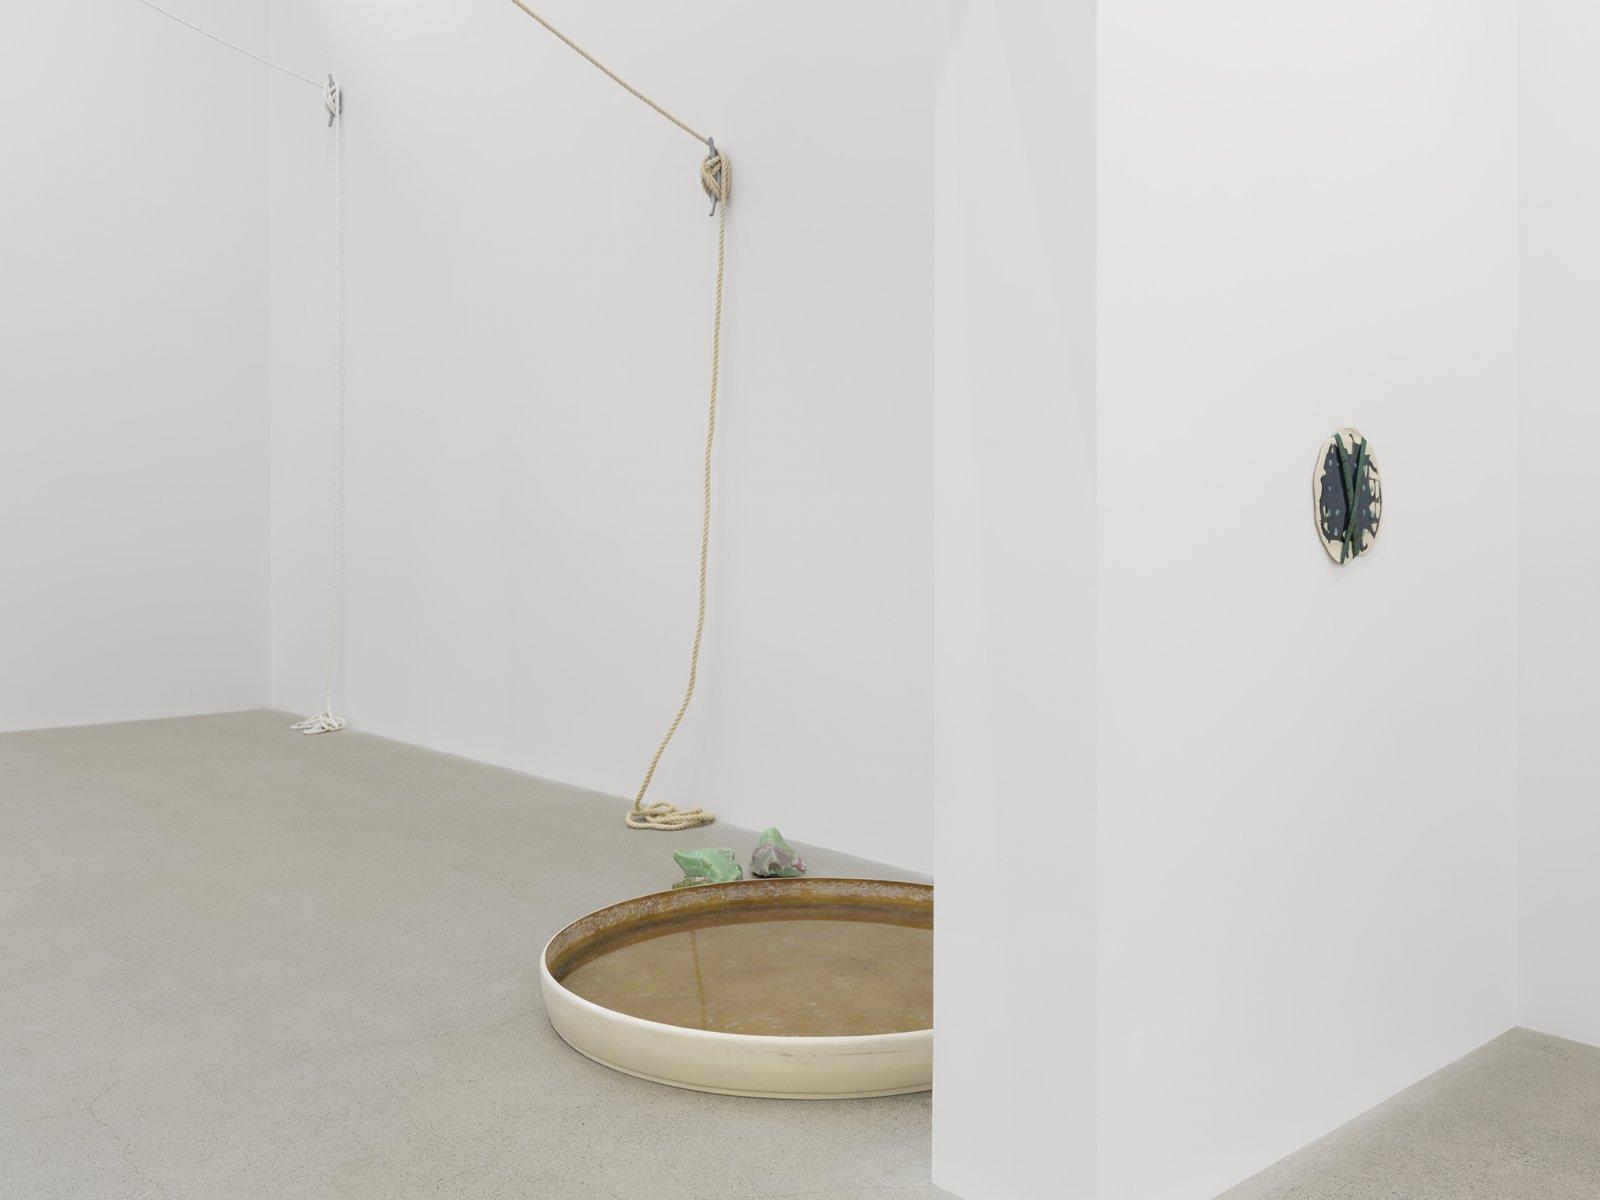 Christina Mackie, installation view, Catriona Jeffries, Vancouver, 2019 by Christina Mackie